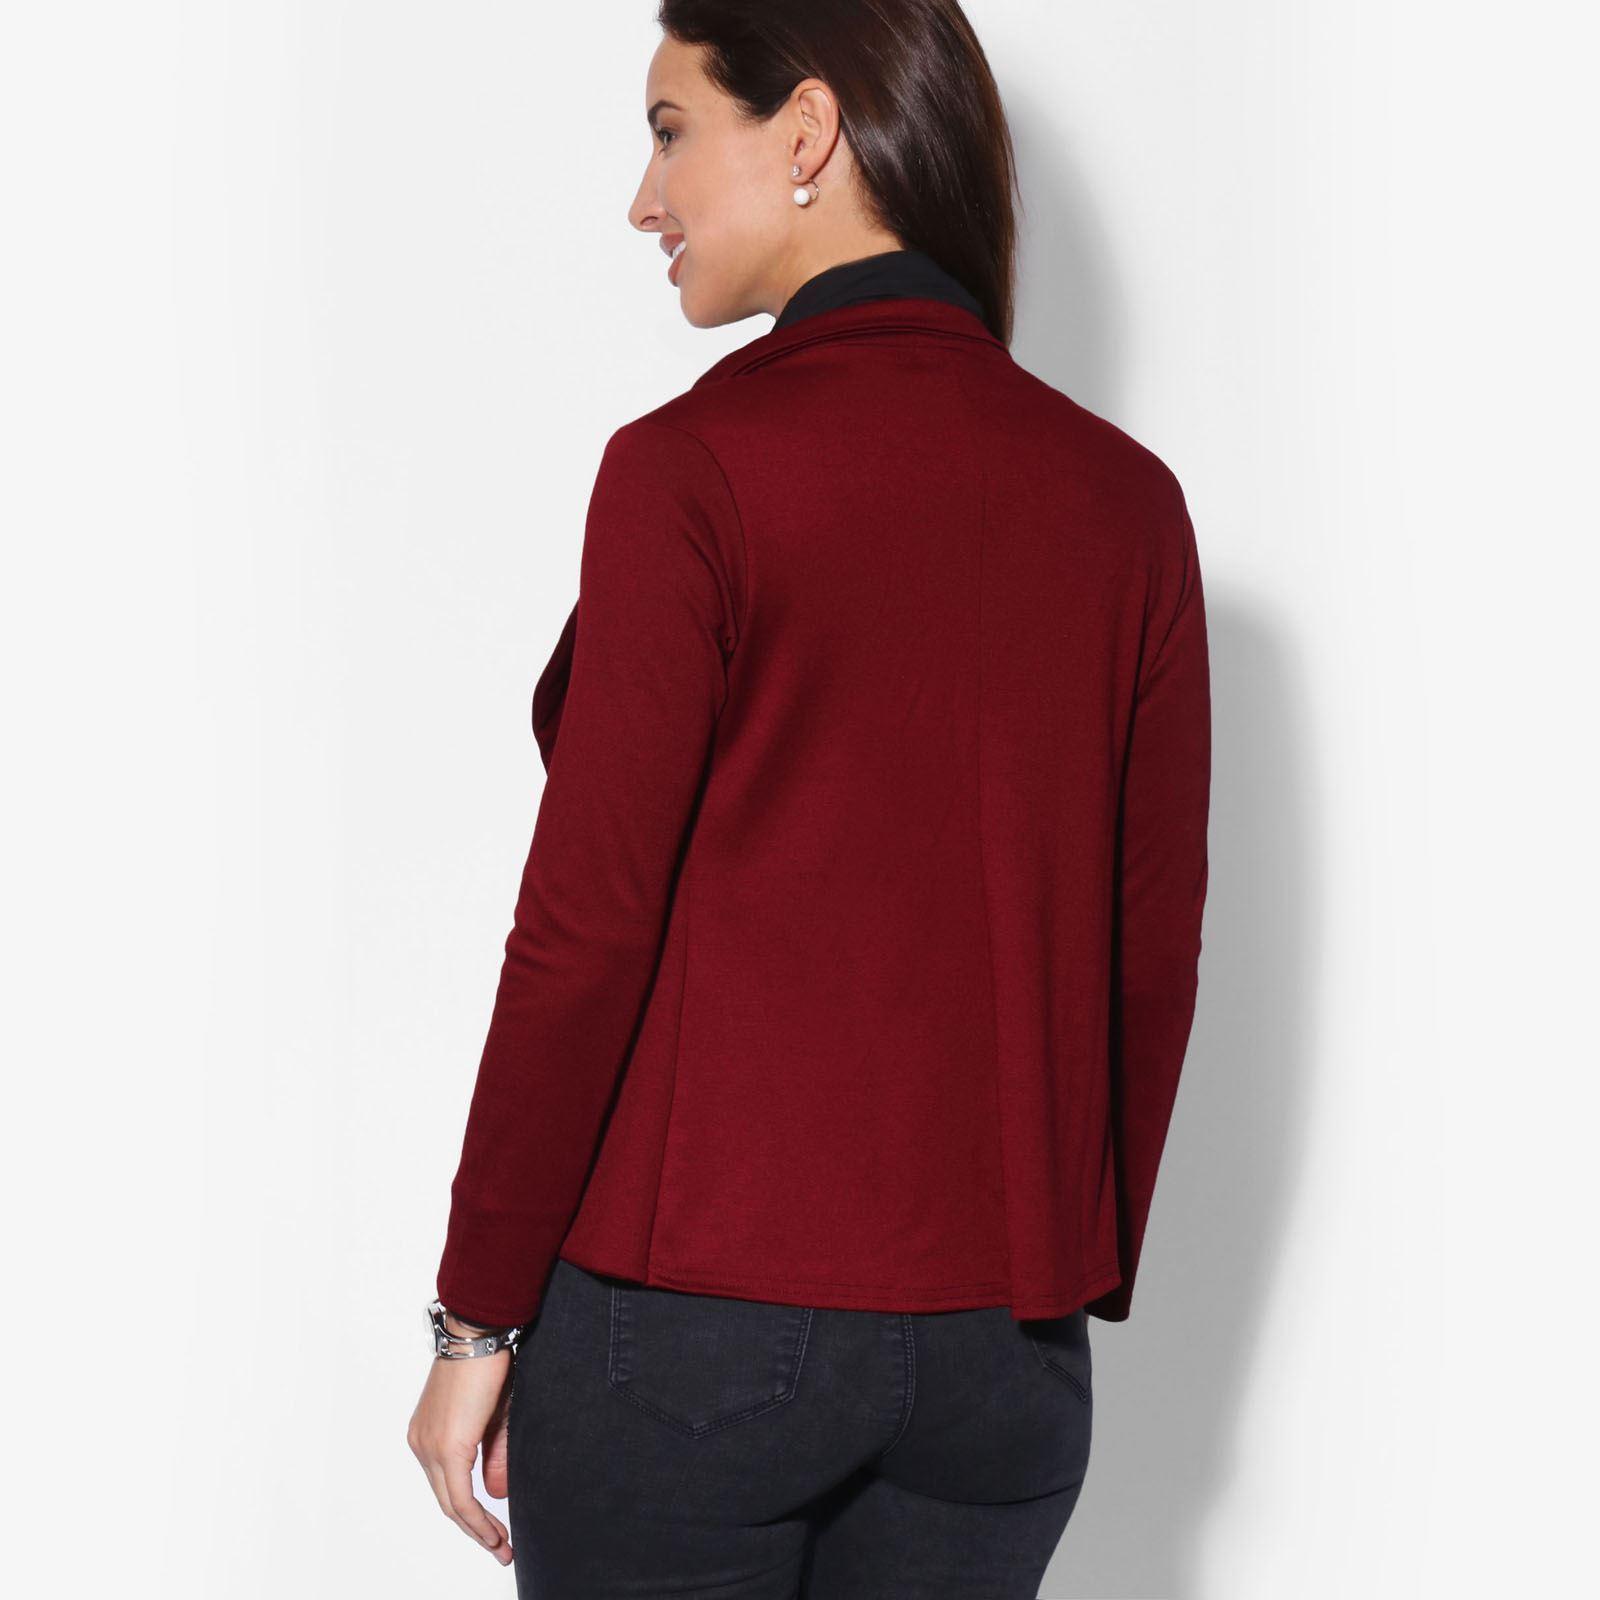 2108166cfb KRISP Womens Slim Fit Casual Smart Jersey Blazer Ladies Office ...